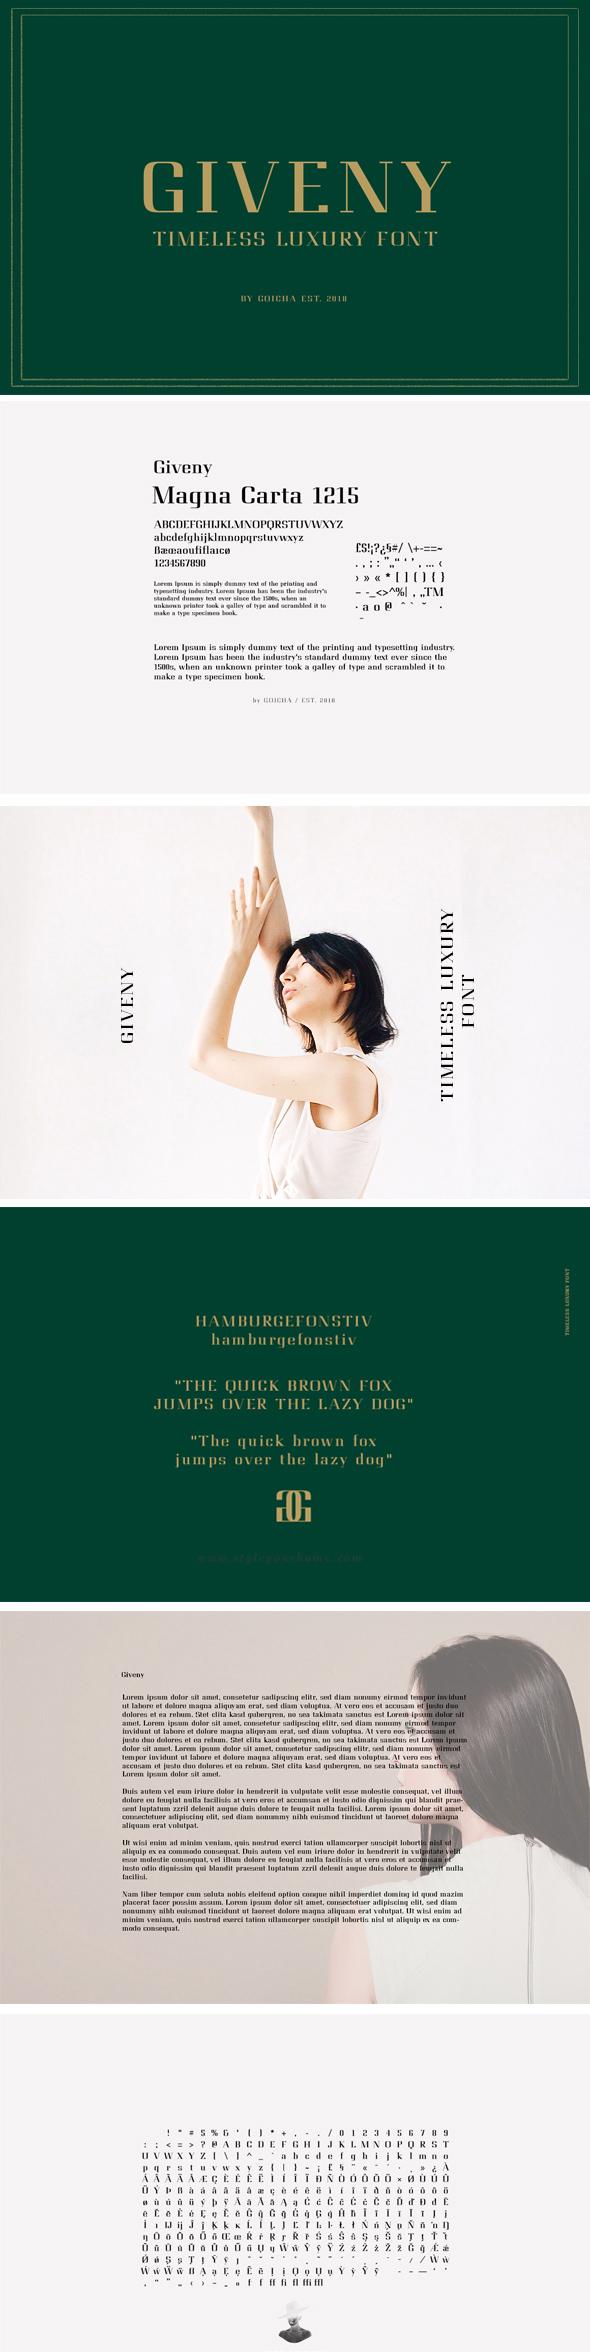 Giveny -  Timeless Luxury Font - Serif Fonts